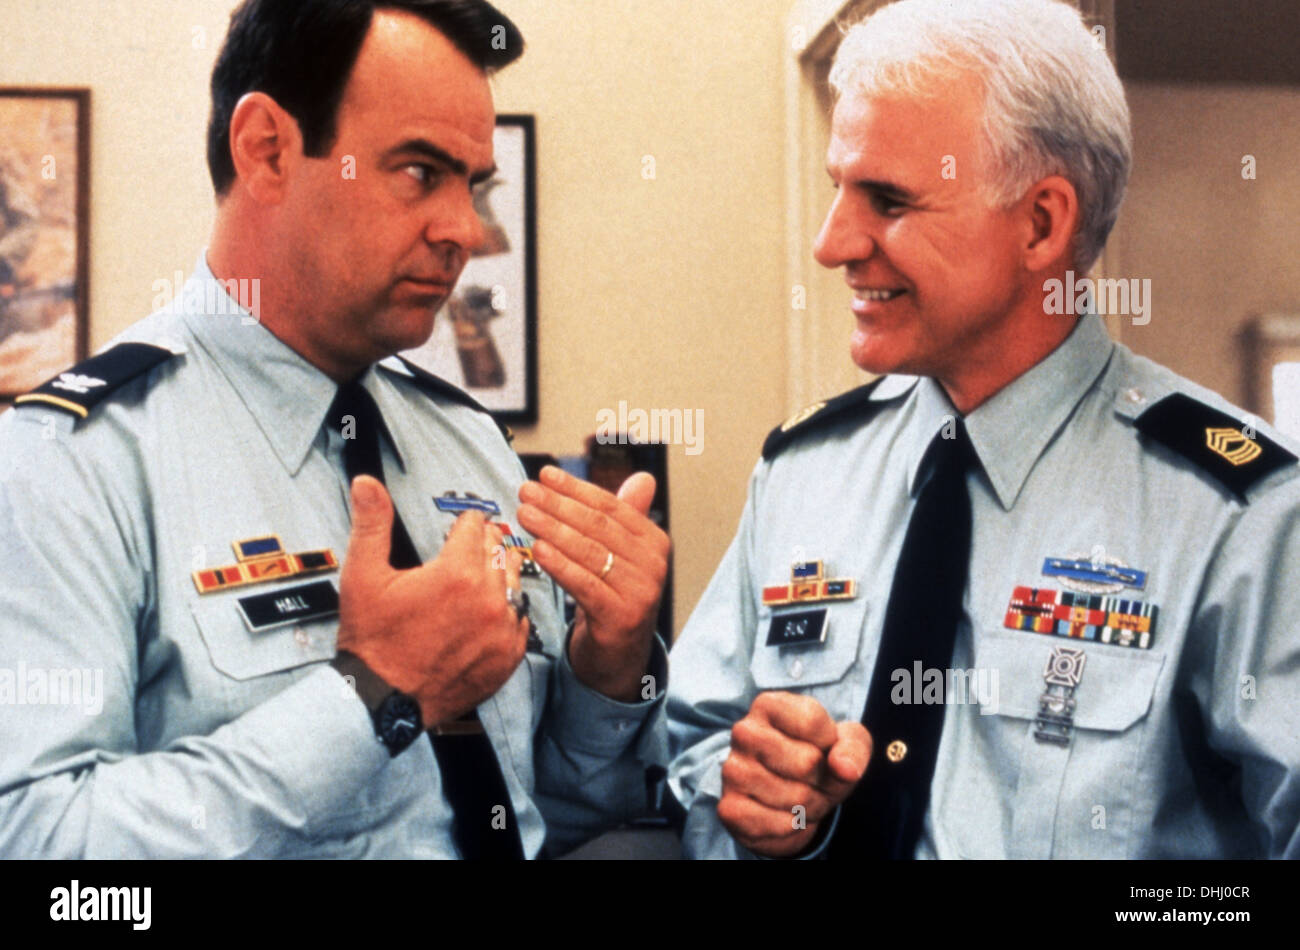 SGT BILKO (1996) DAN AYKROYD, STEVE MARTIN, JONATHAN LYNN (DIR) 004 MOVIESTORE COLLECTION LTD - Stock Image